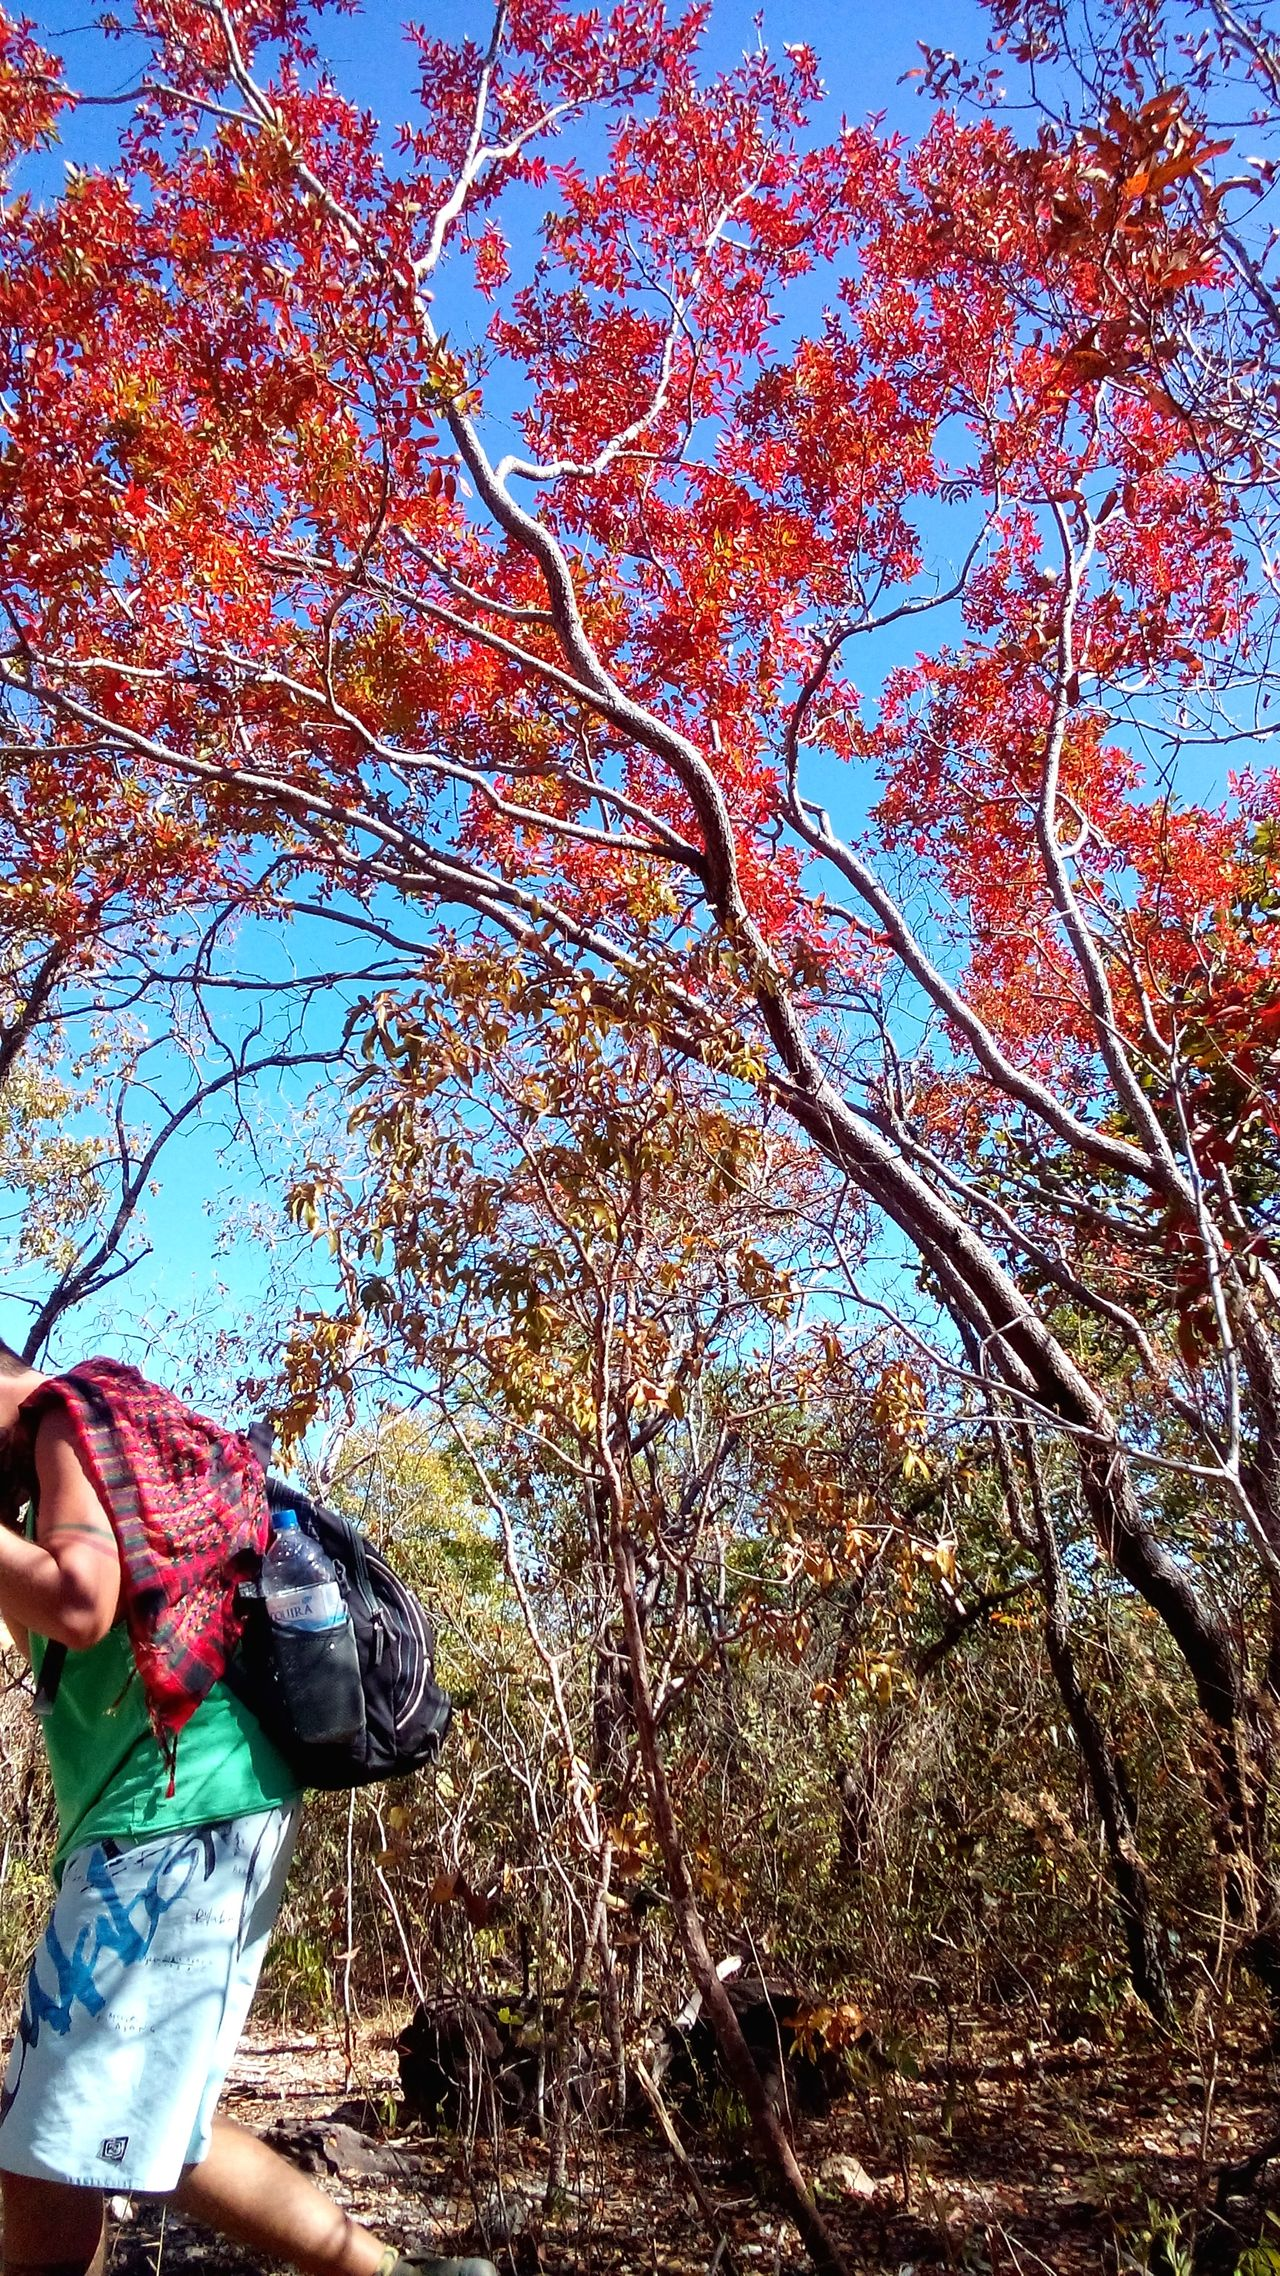 Chapadadosveadeiros EyeEm Brasil Nature Photography Nature_collection Eyemphotography Travel Photography Chapada Dos Veadeiros Enjoying Life The Weekend On EyeEm Colorful Goias São Jorge Brasil ♥ Brazil